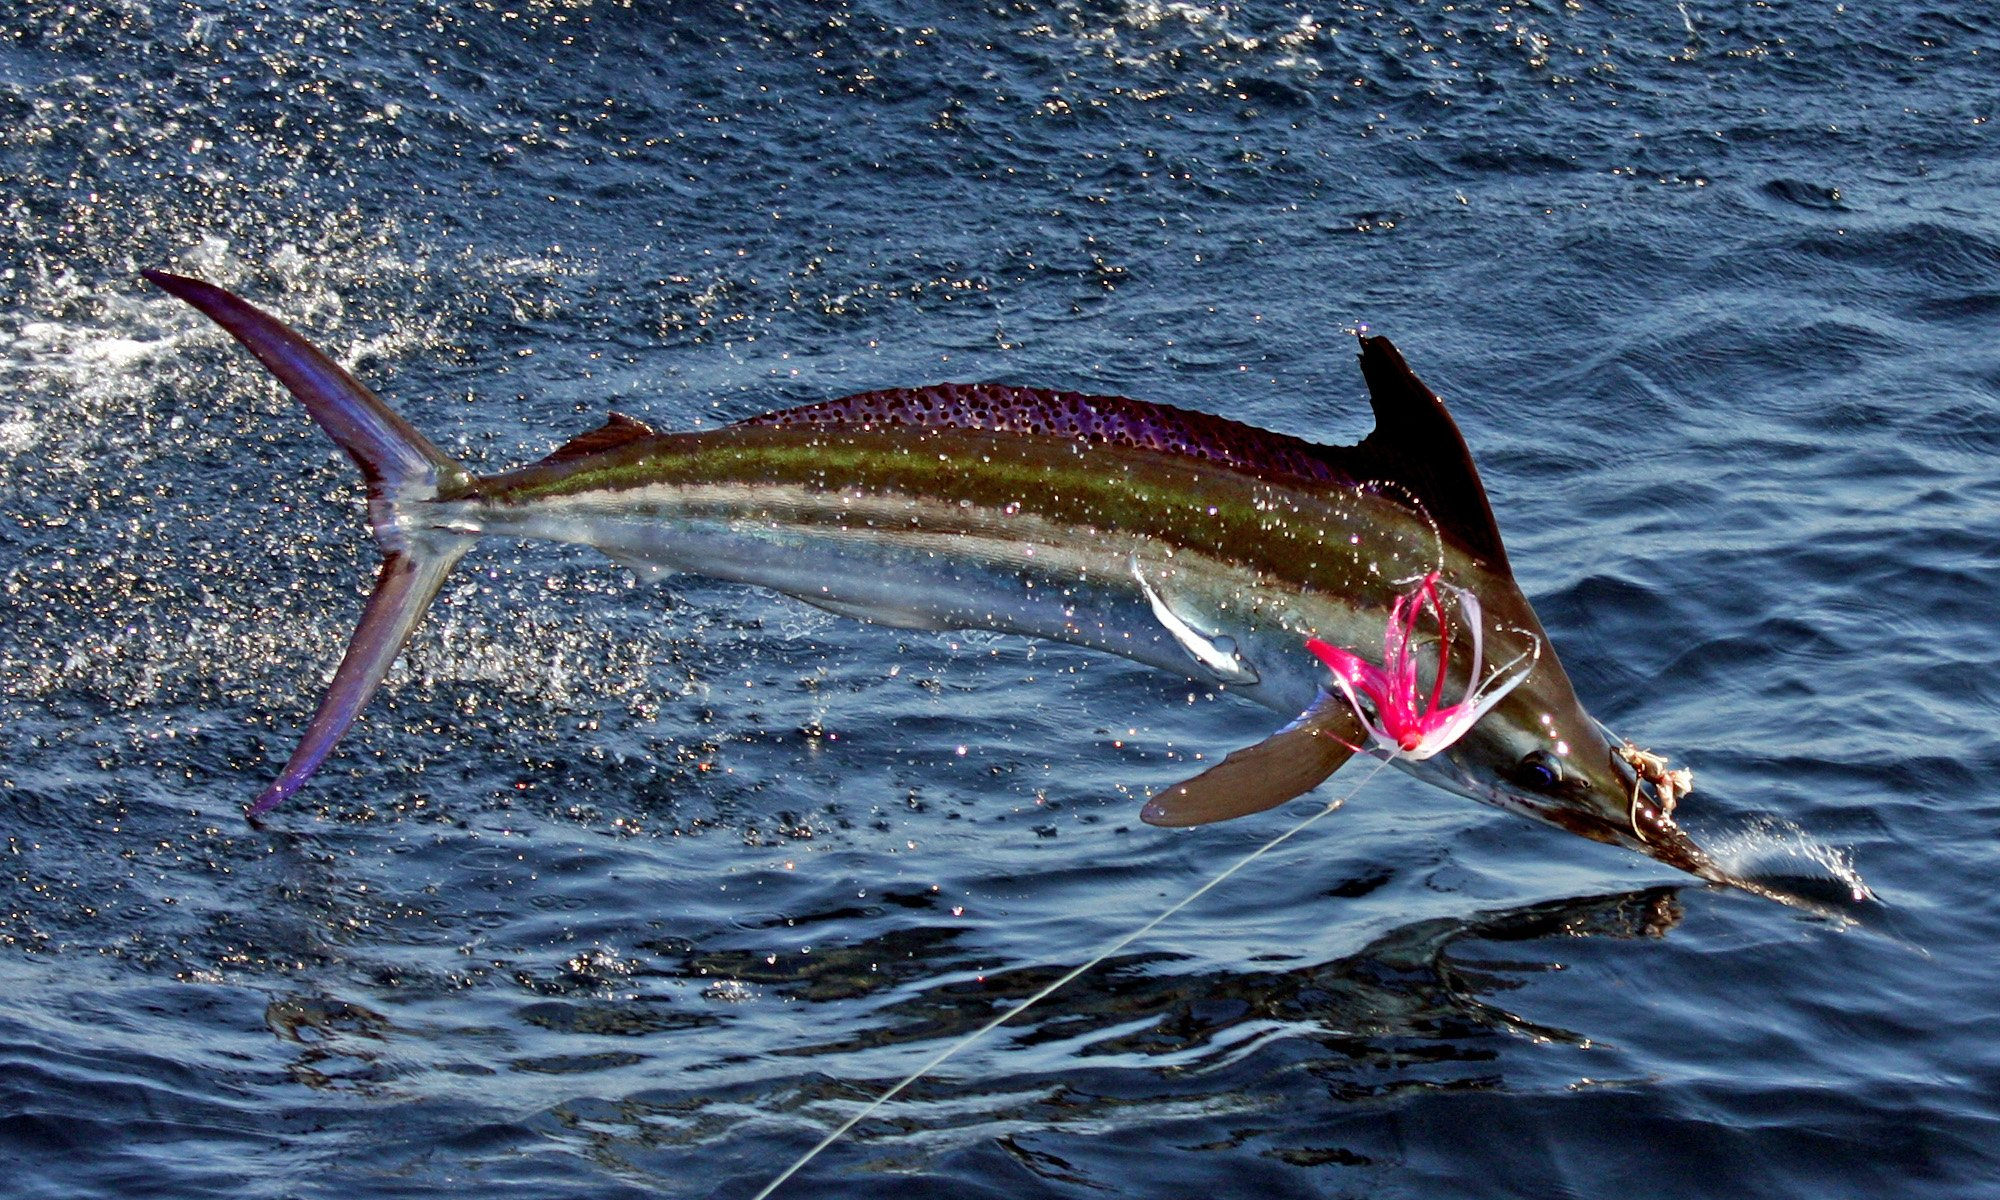 Fishing Fish Sport Water Fishes Marlin Ocean Sea Battle